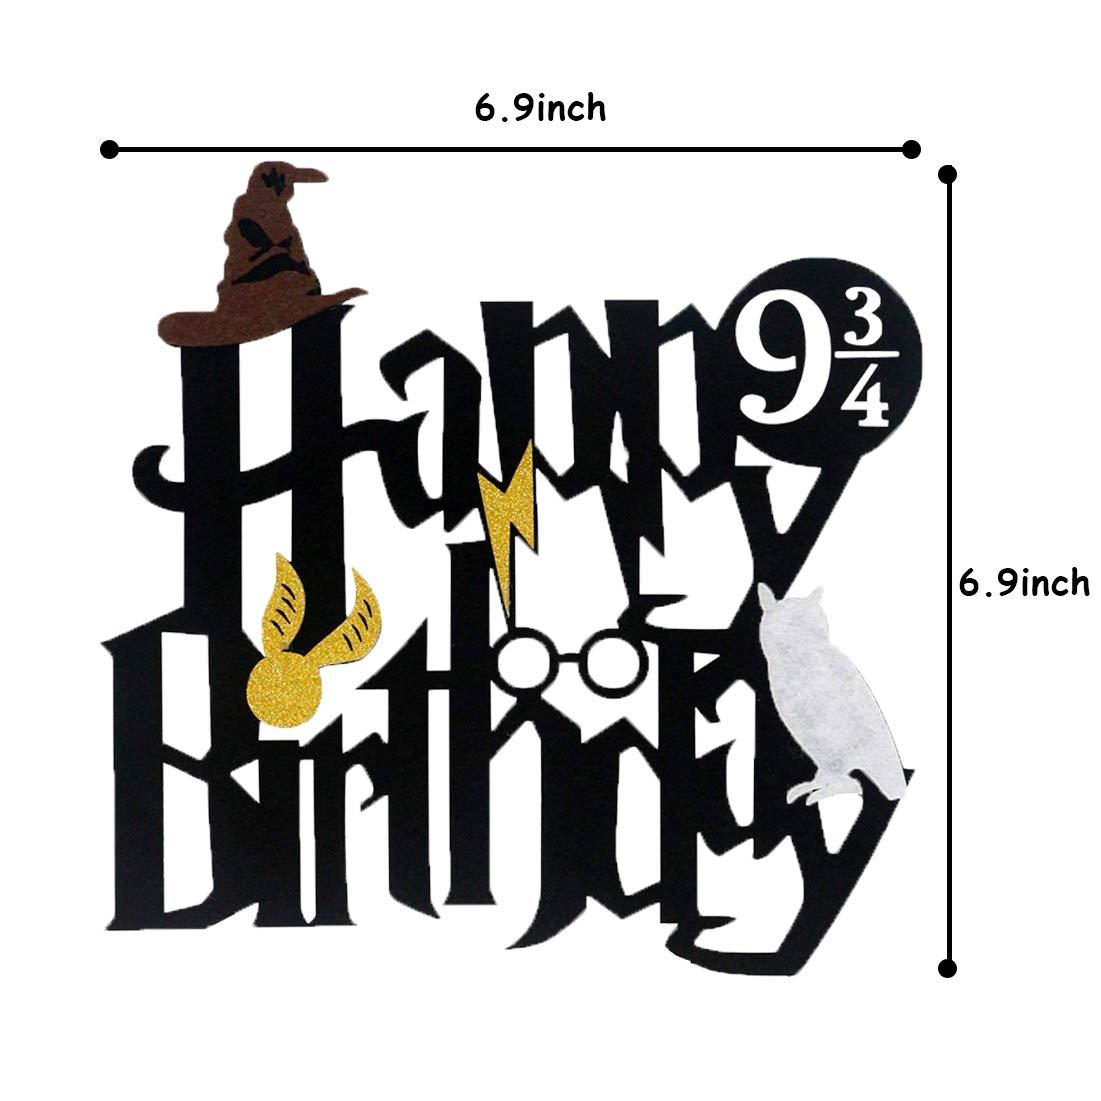 Harry Potter Cake Toppers Cumpleaños Decoraciones de Pastel ...